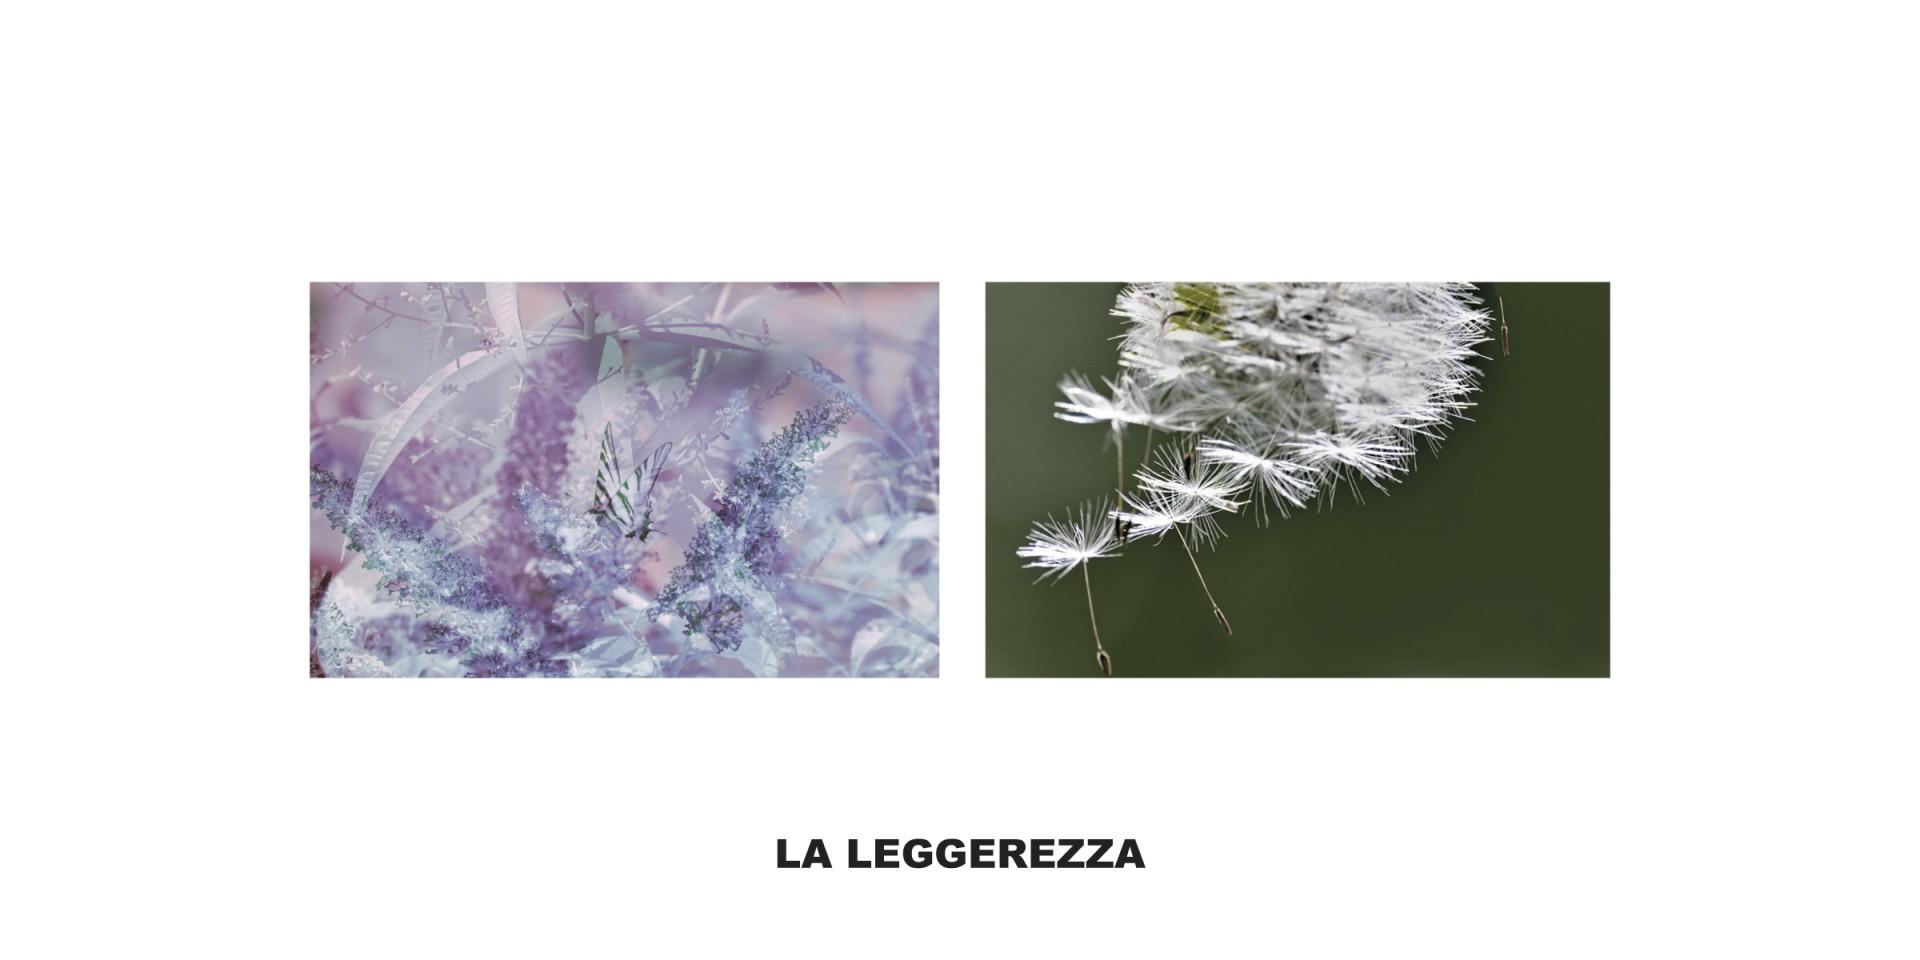 04-slide-la-leggerezza-7.jpg